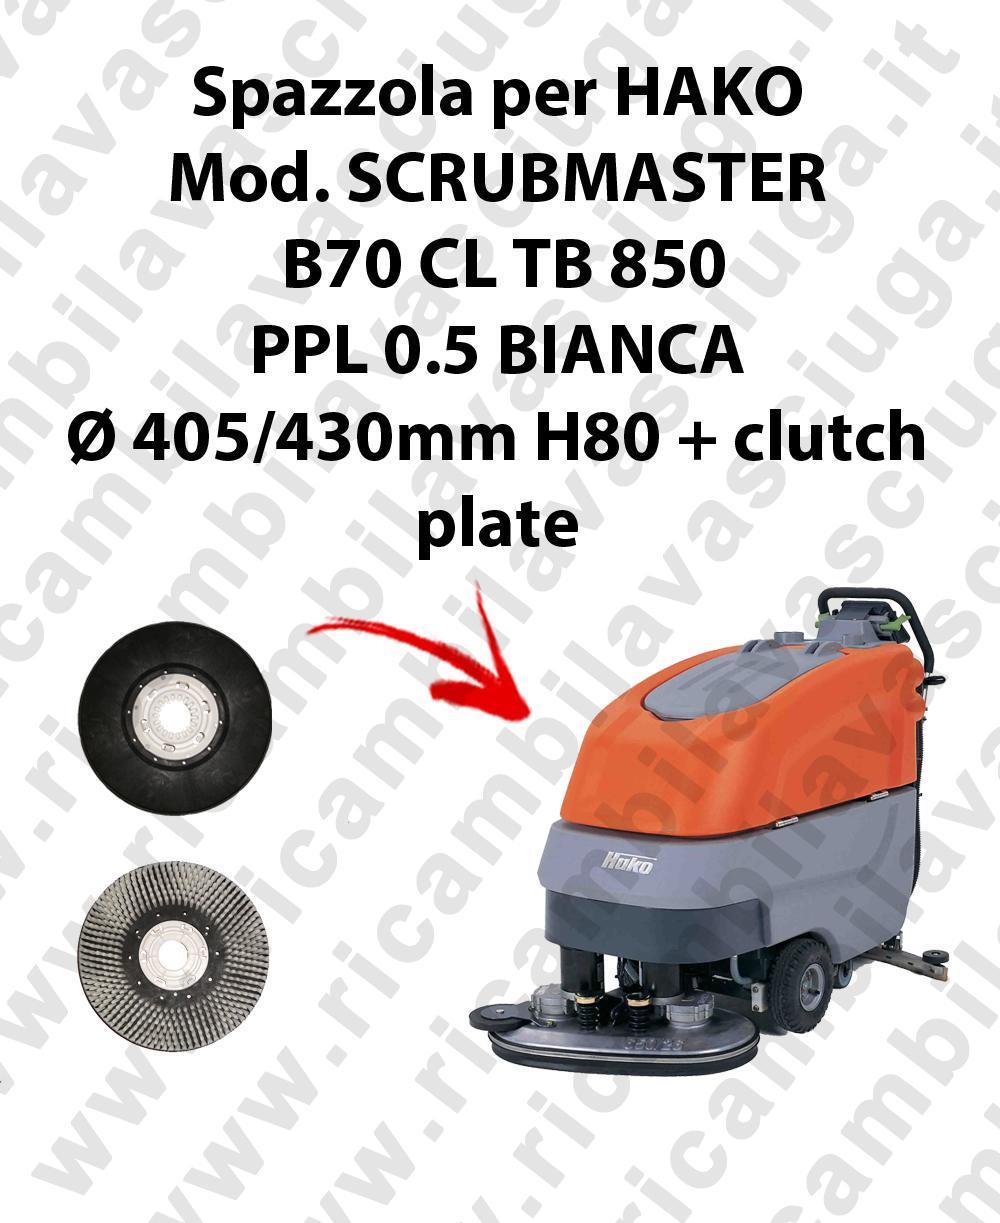 Hako Scrubmaster B70 Scrubber: Cleaning Brush For Scrubber Dryer HAKO Model SCRUBMASTER